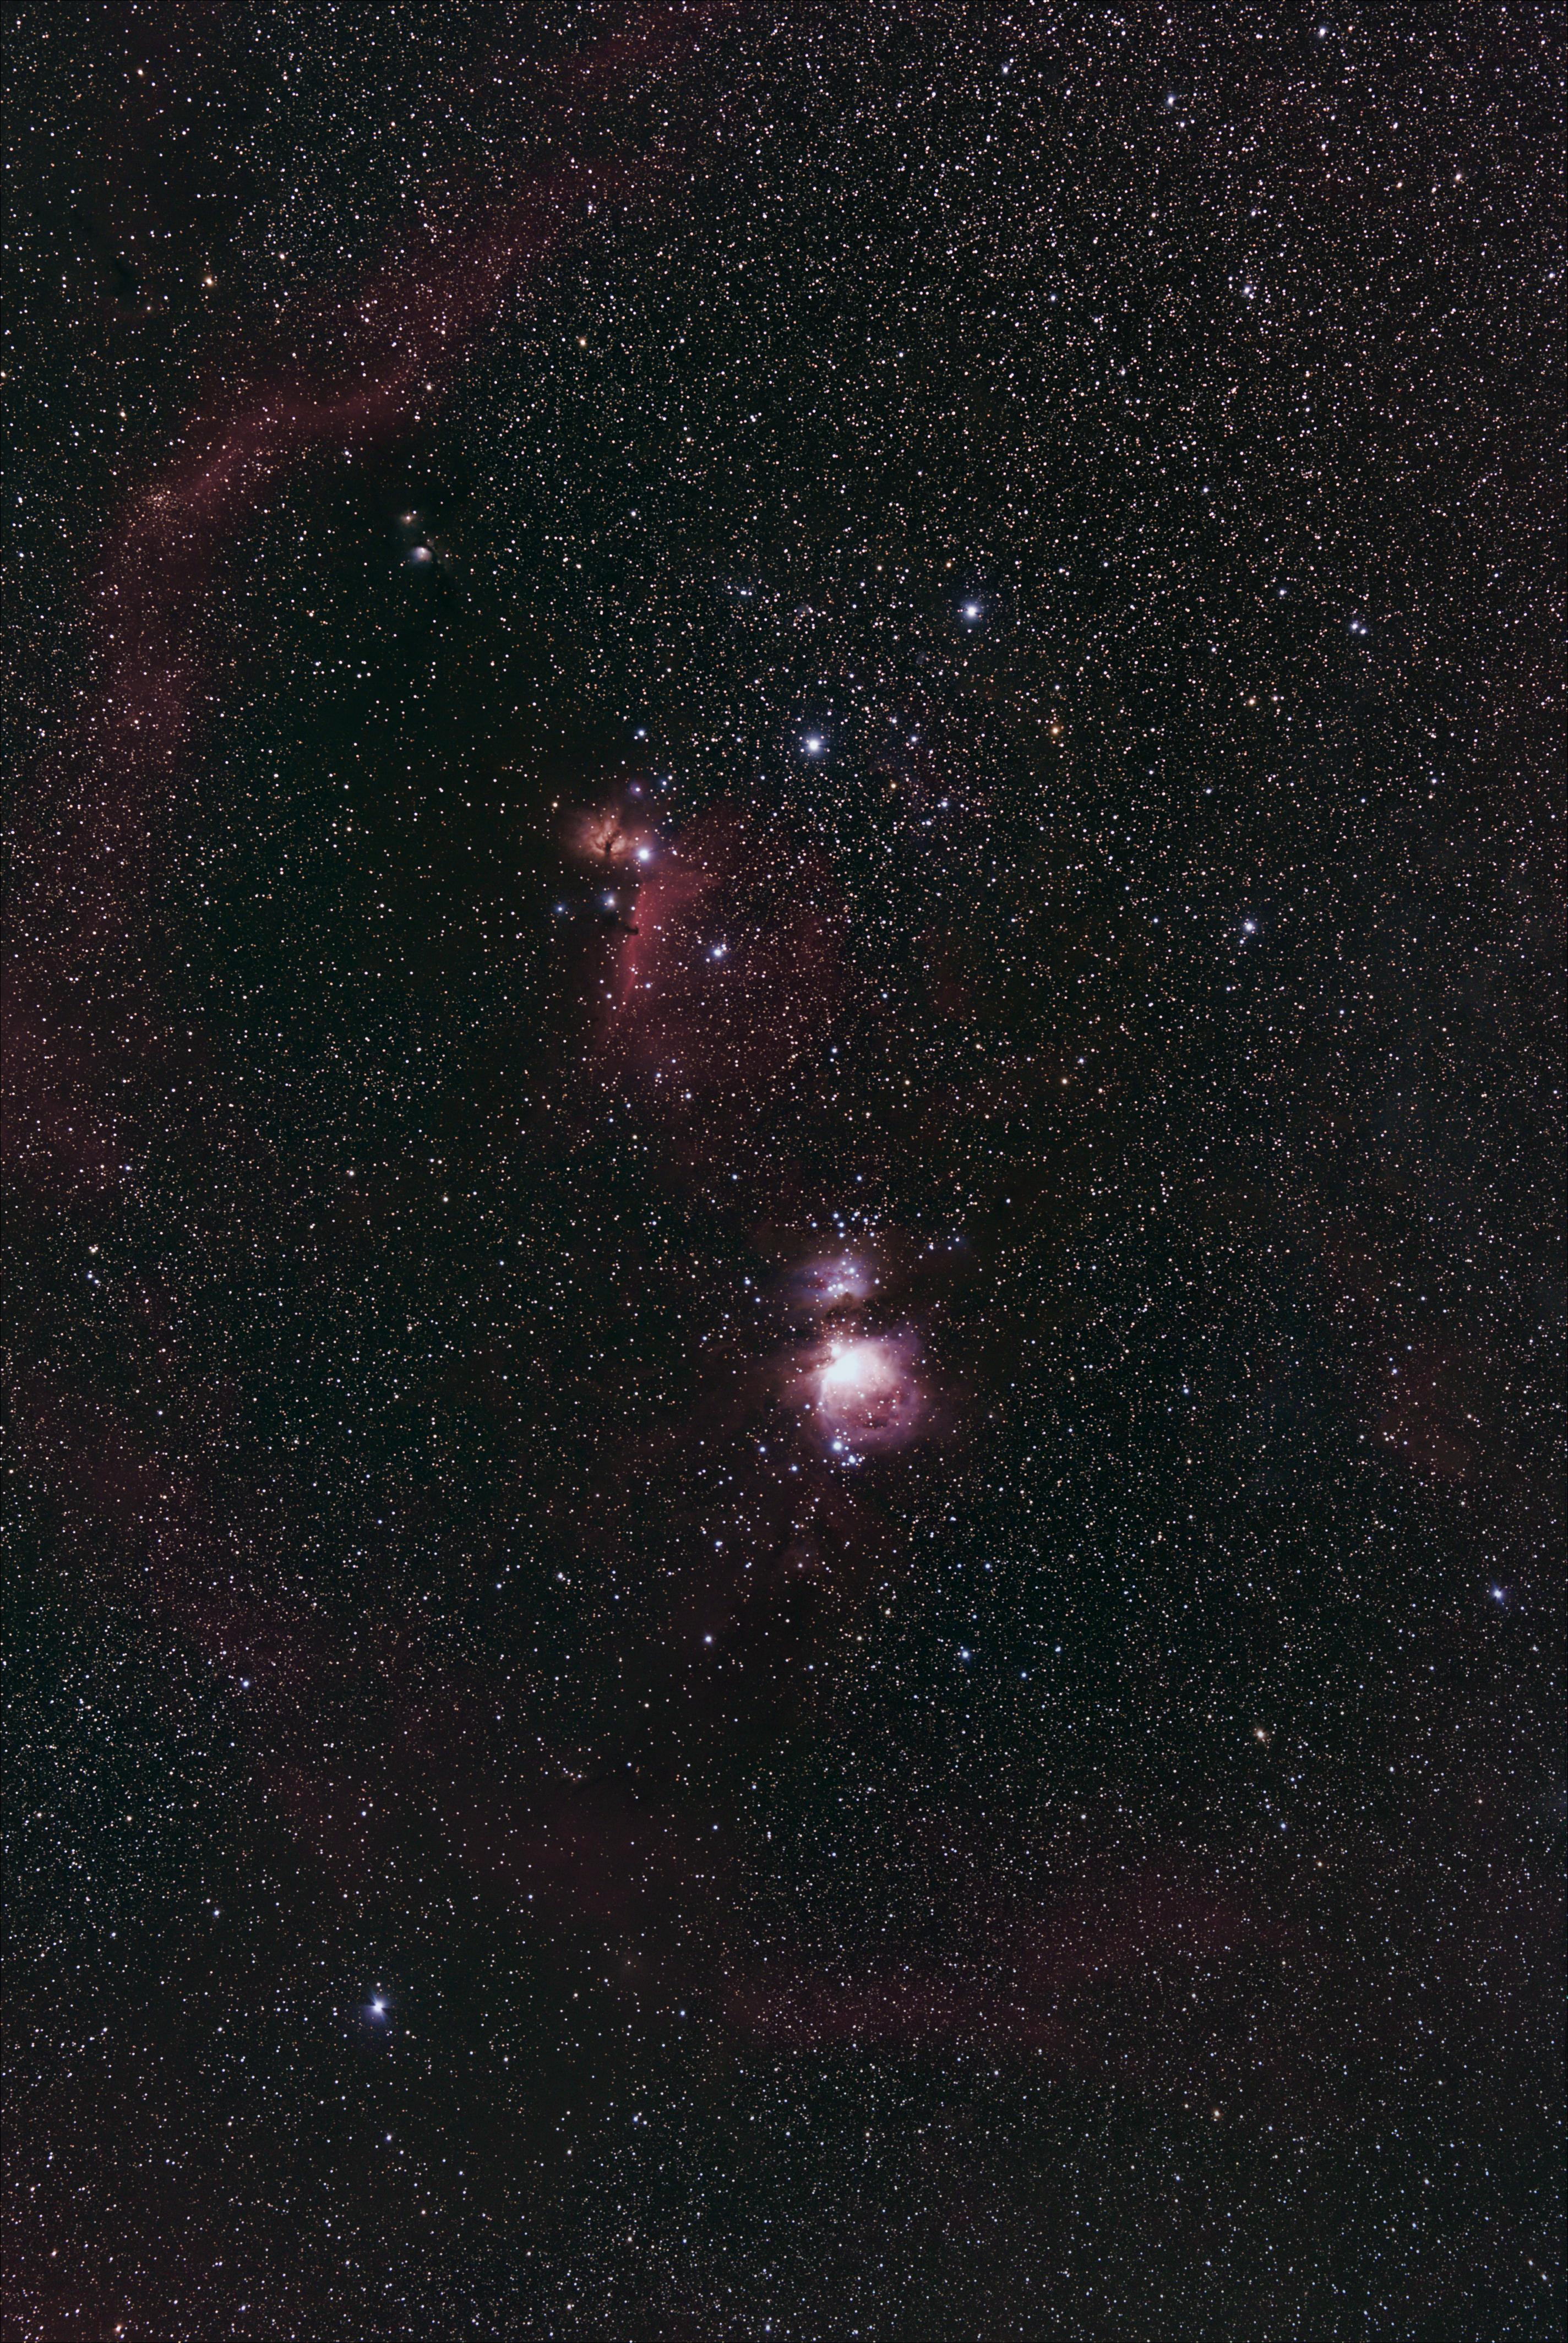 Orion-sud-2019-02-05.jpg